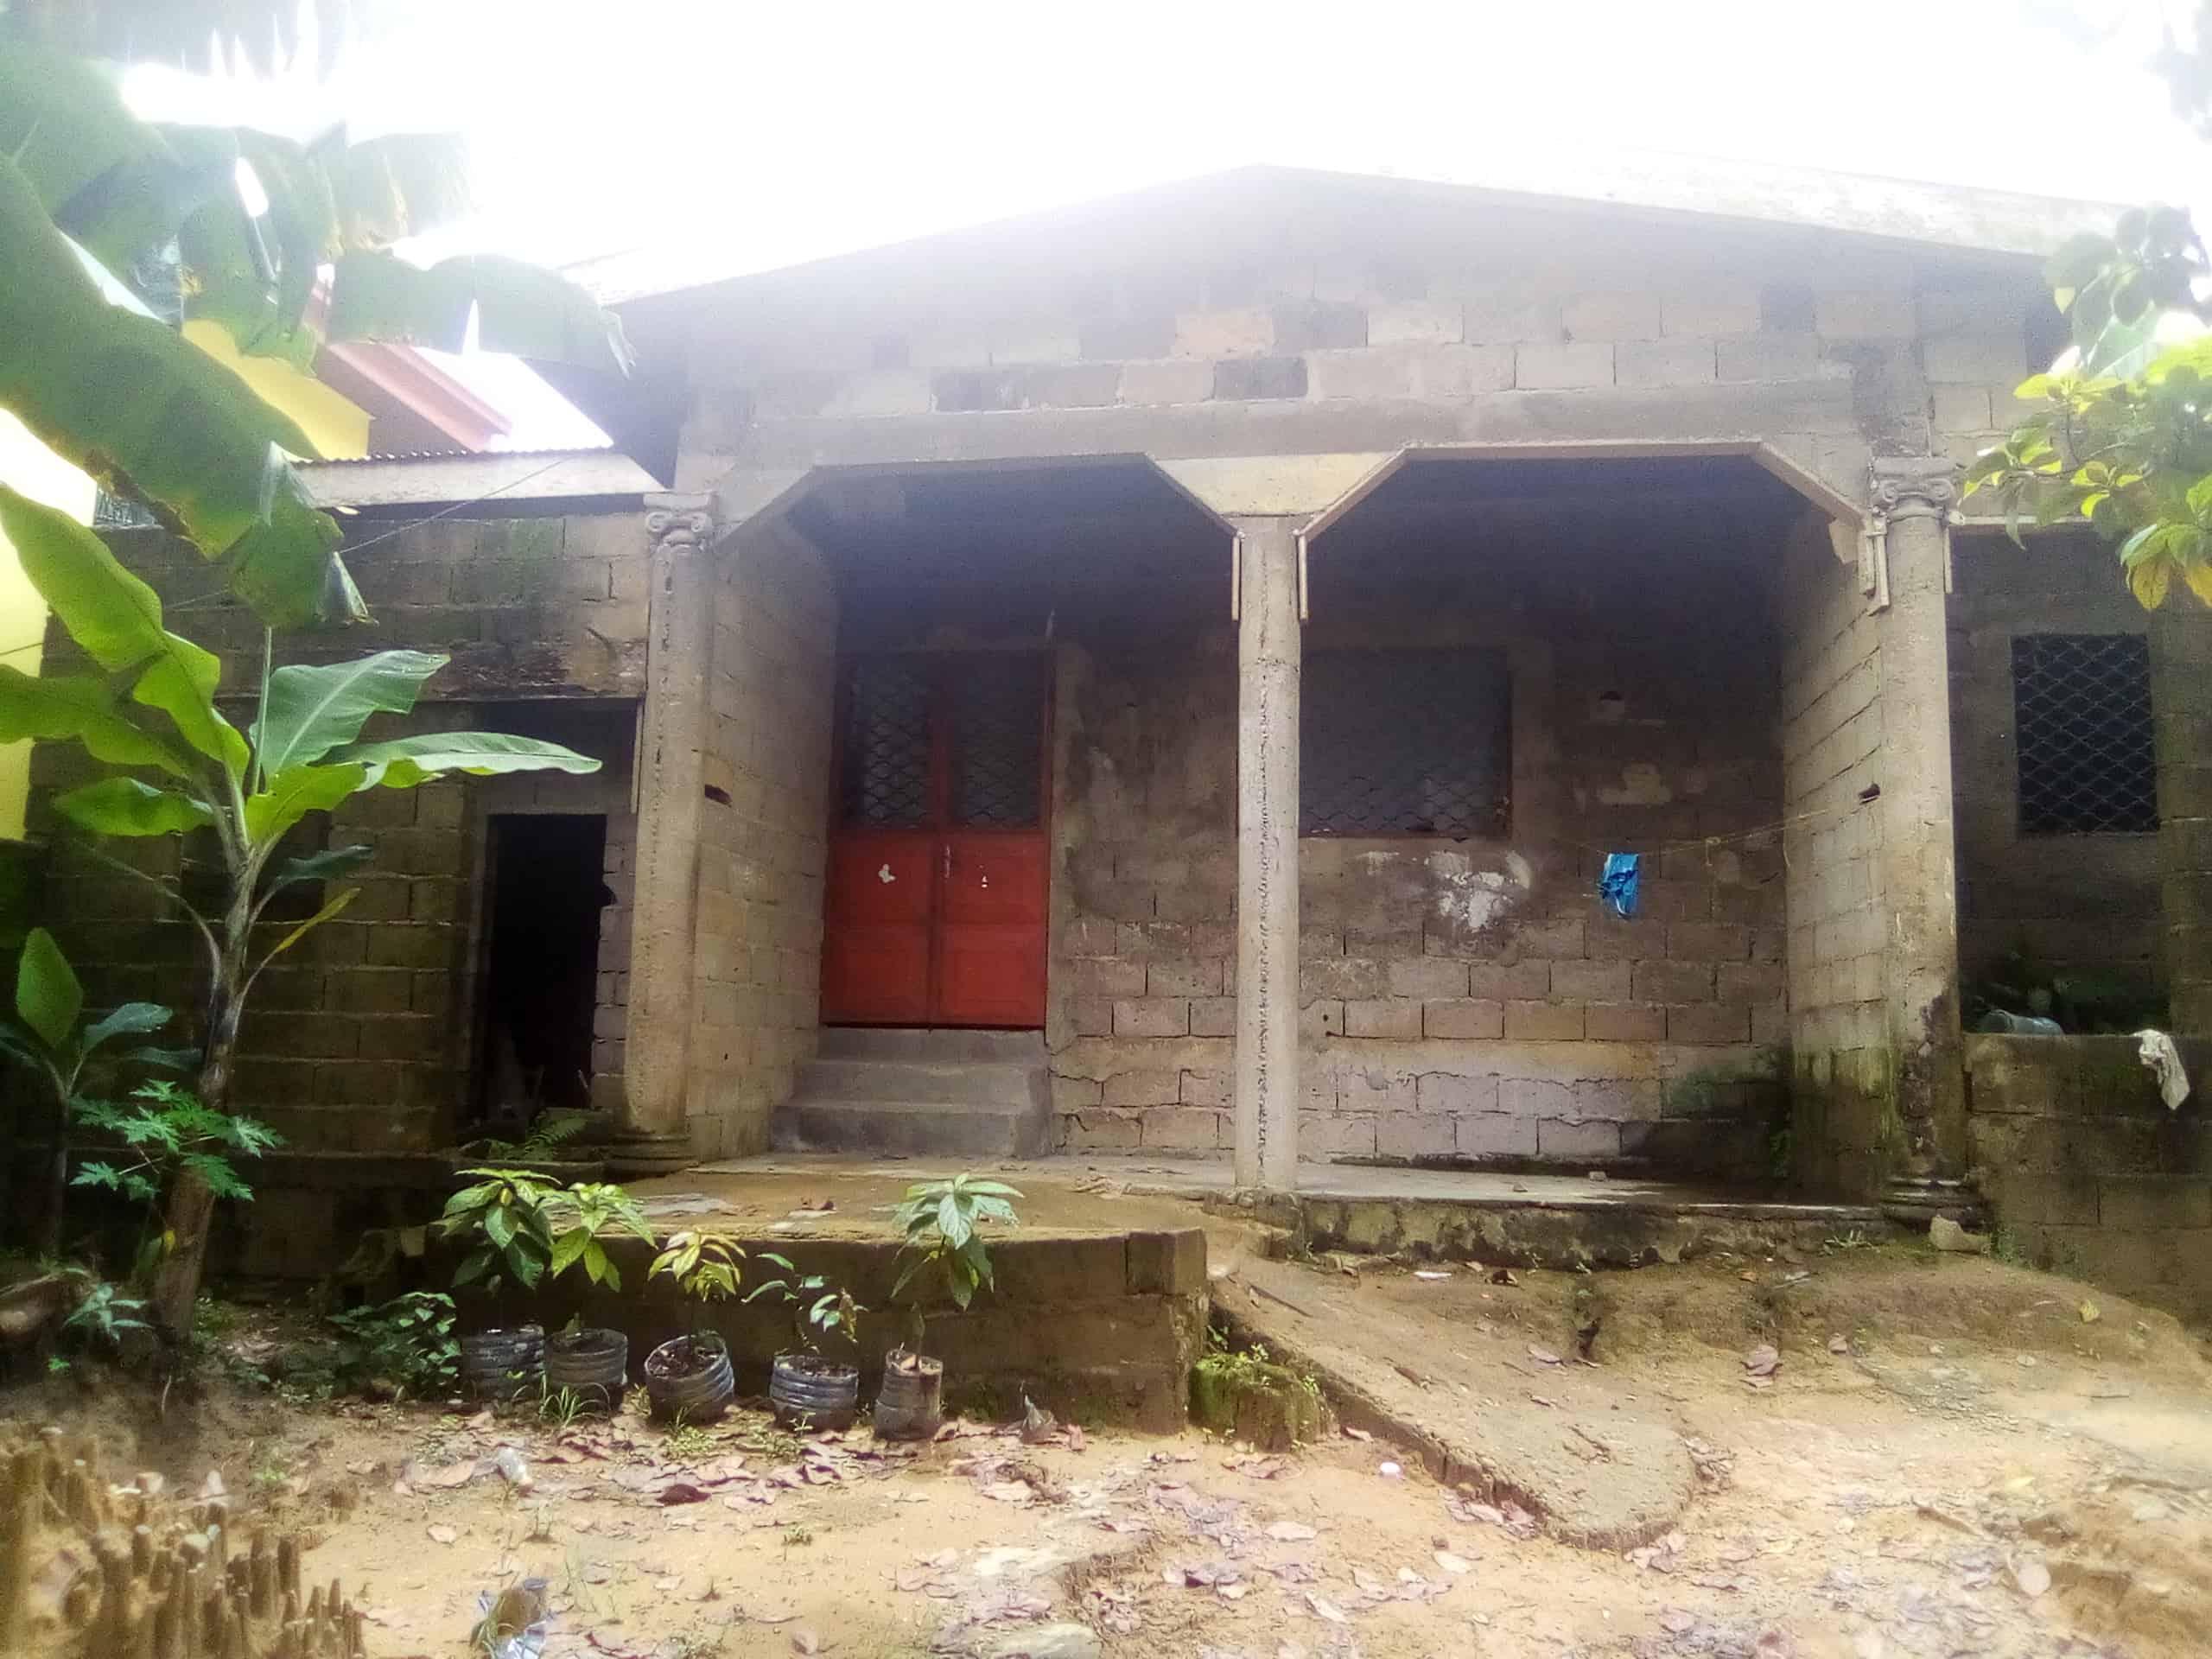 Land for sale at Douala, Logpom, Bangos - 300 m2 - 13 000 000 FCFA